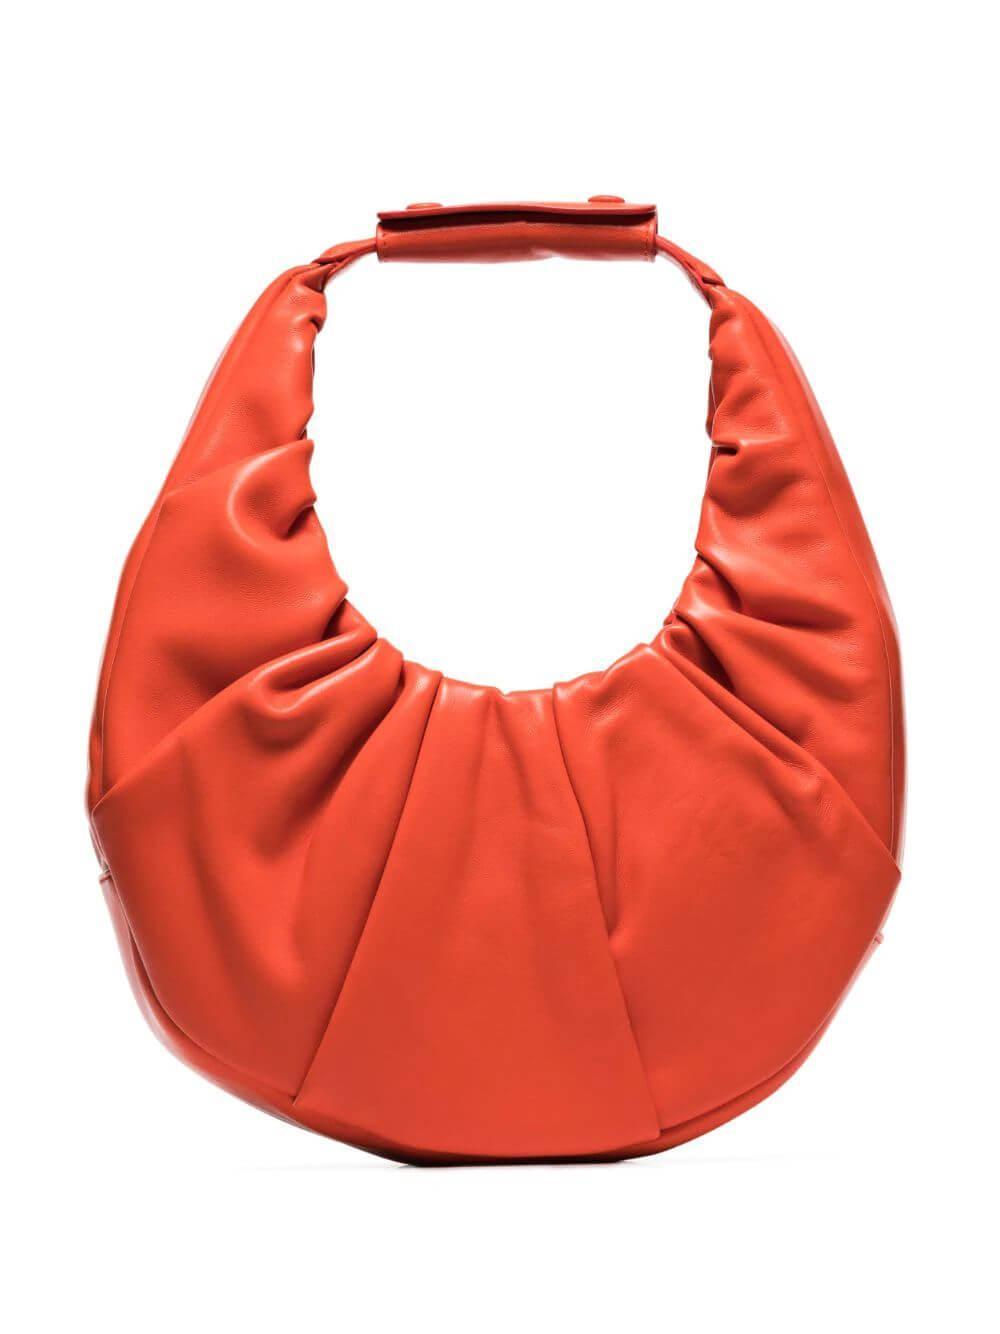 Soft Moon Bag Item # 207-9263-HWRD